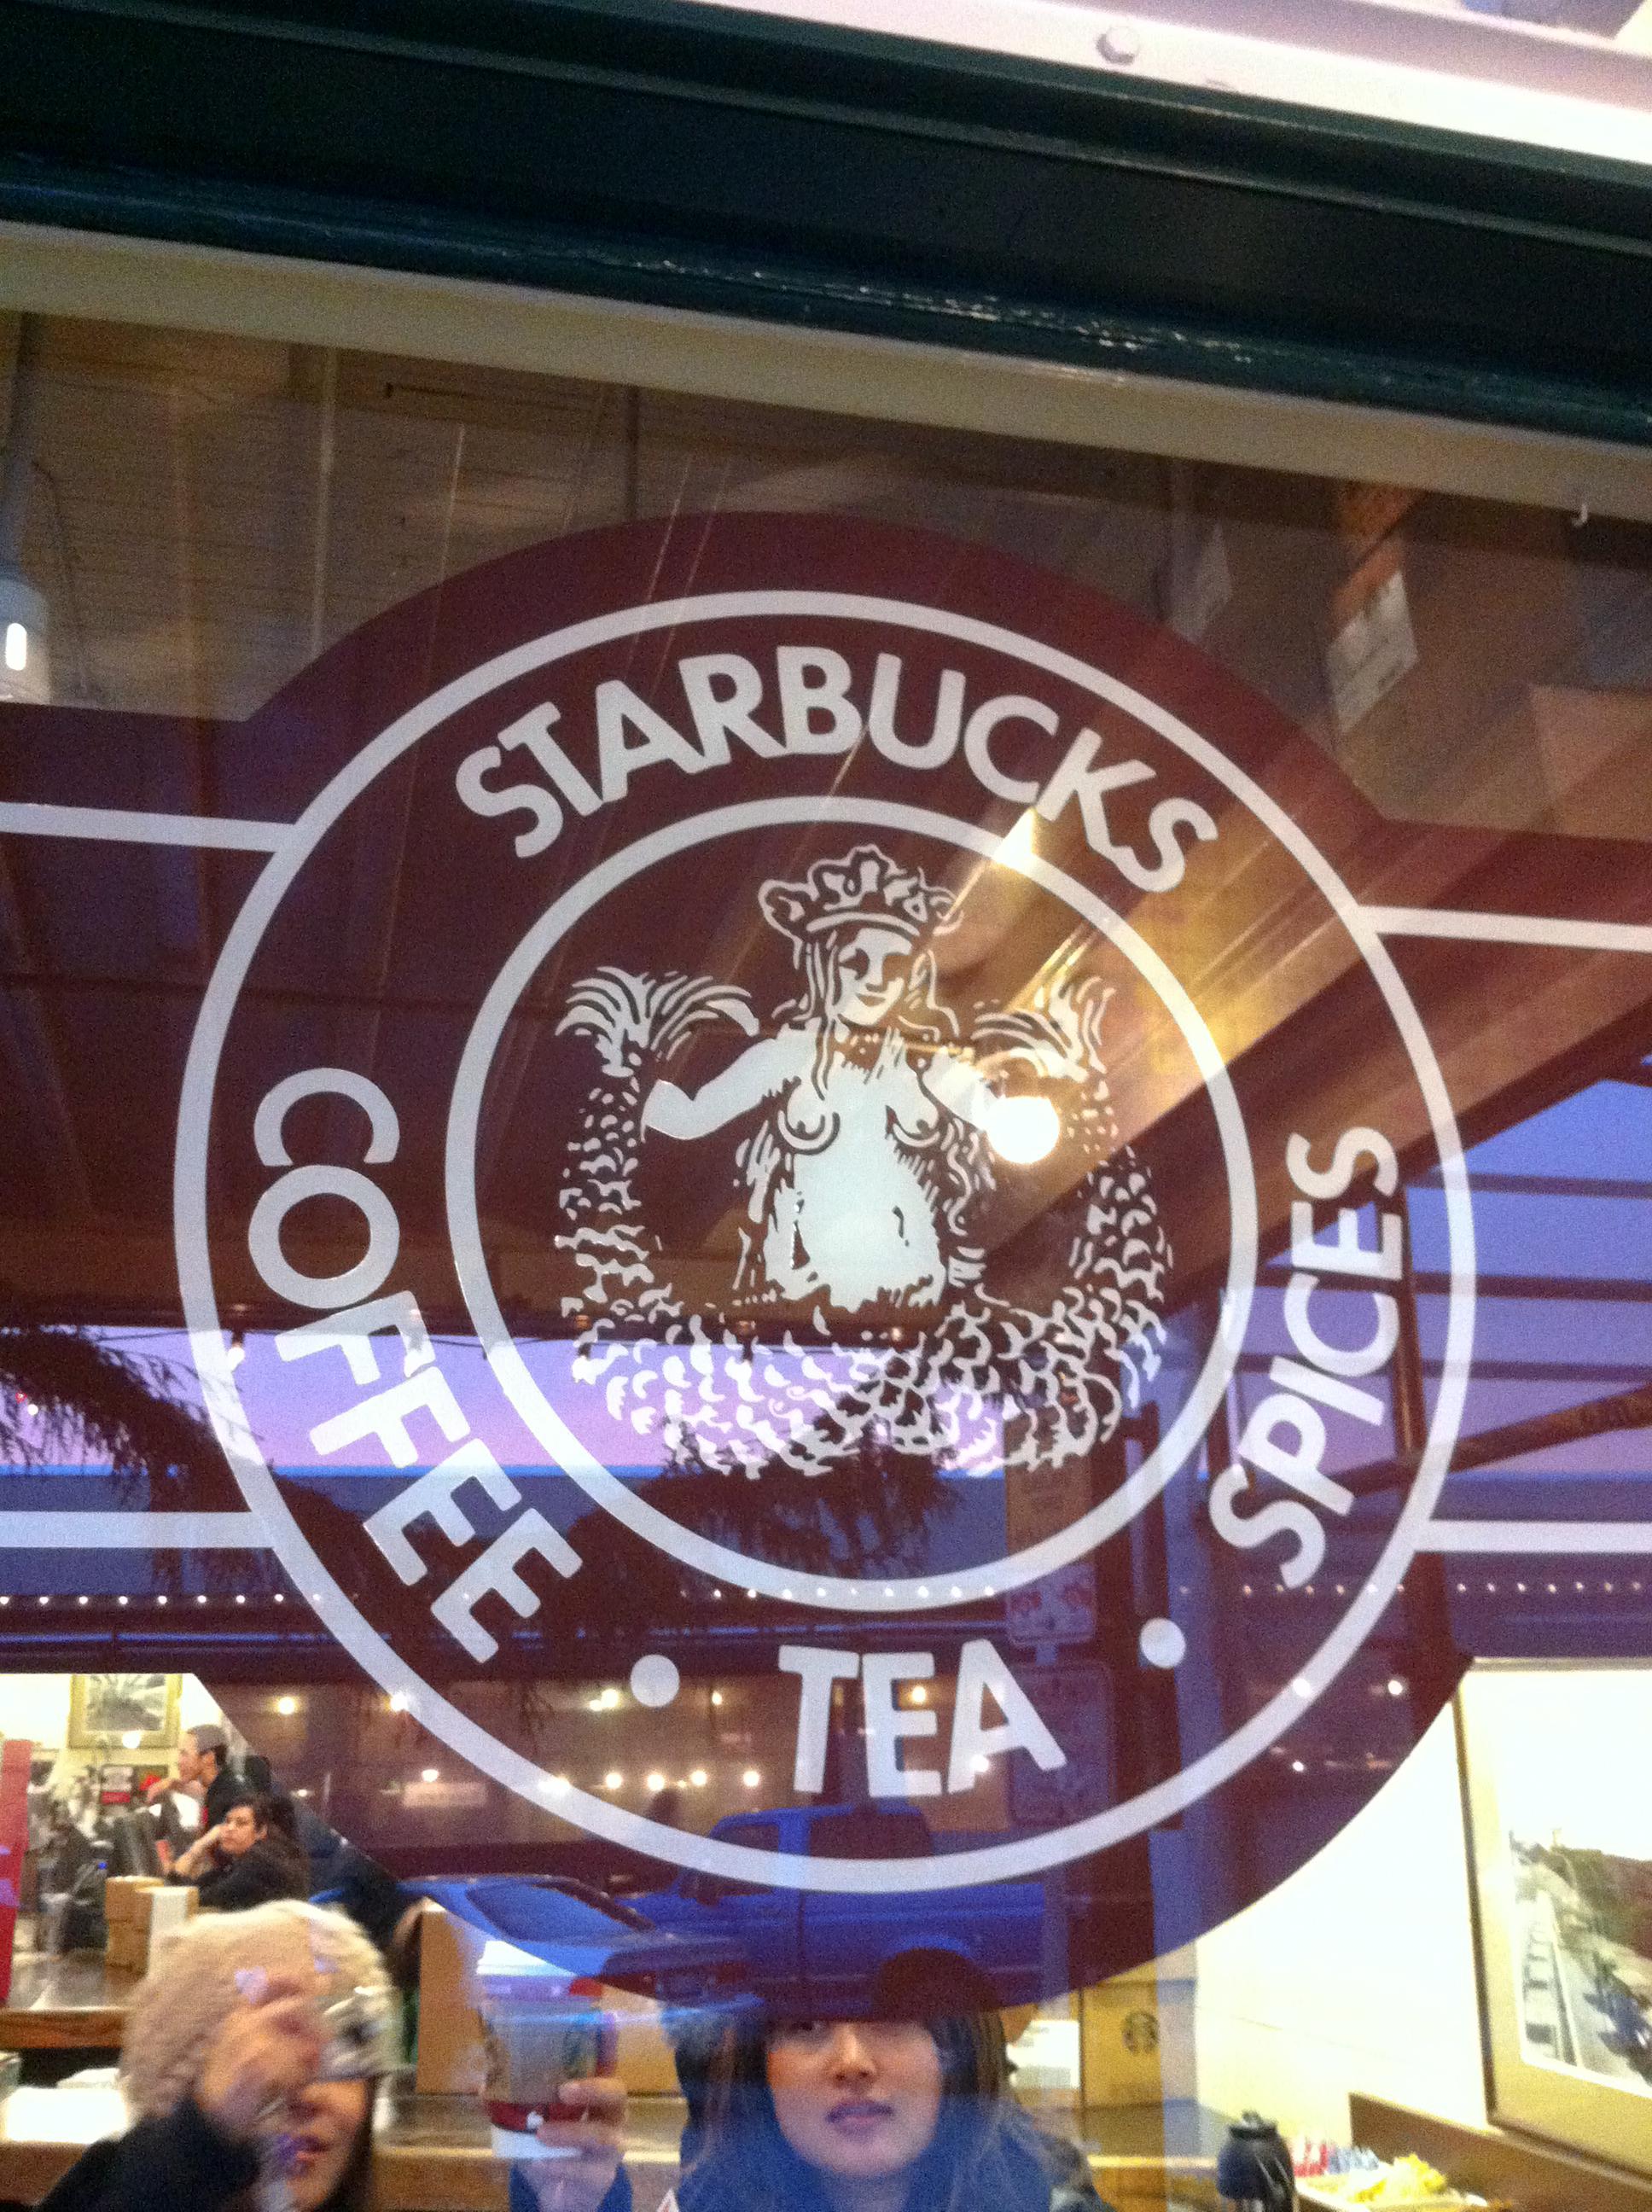 Starbucks_Original_location_and_sign-2